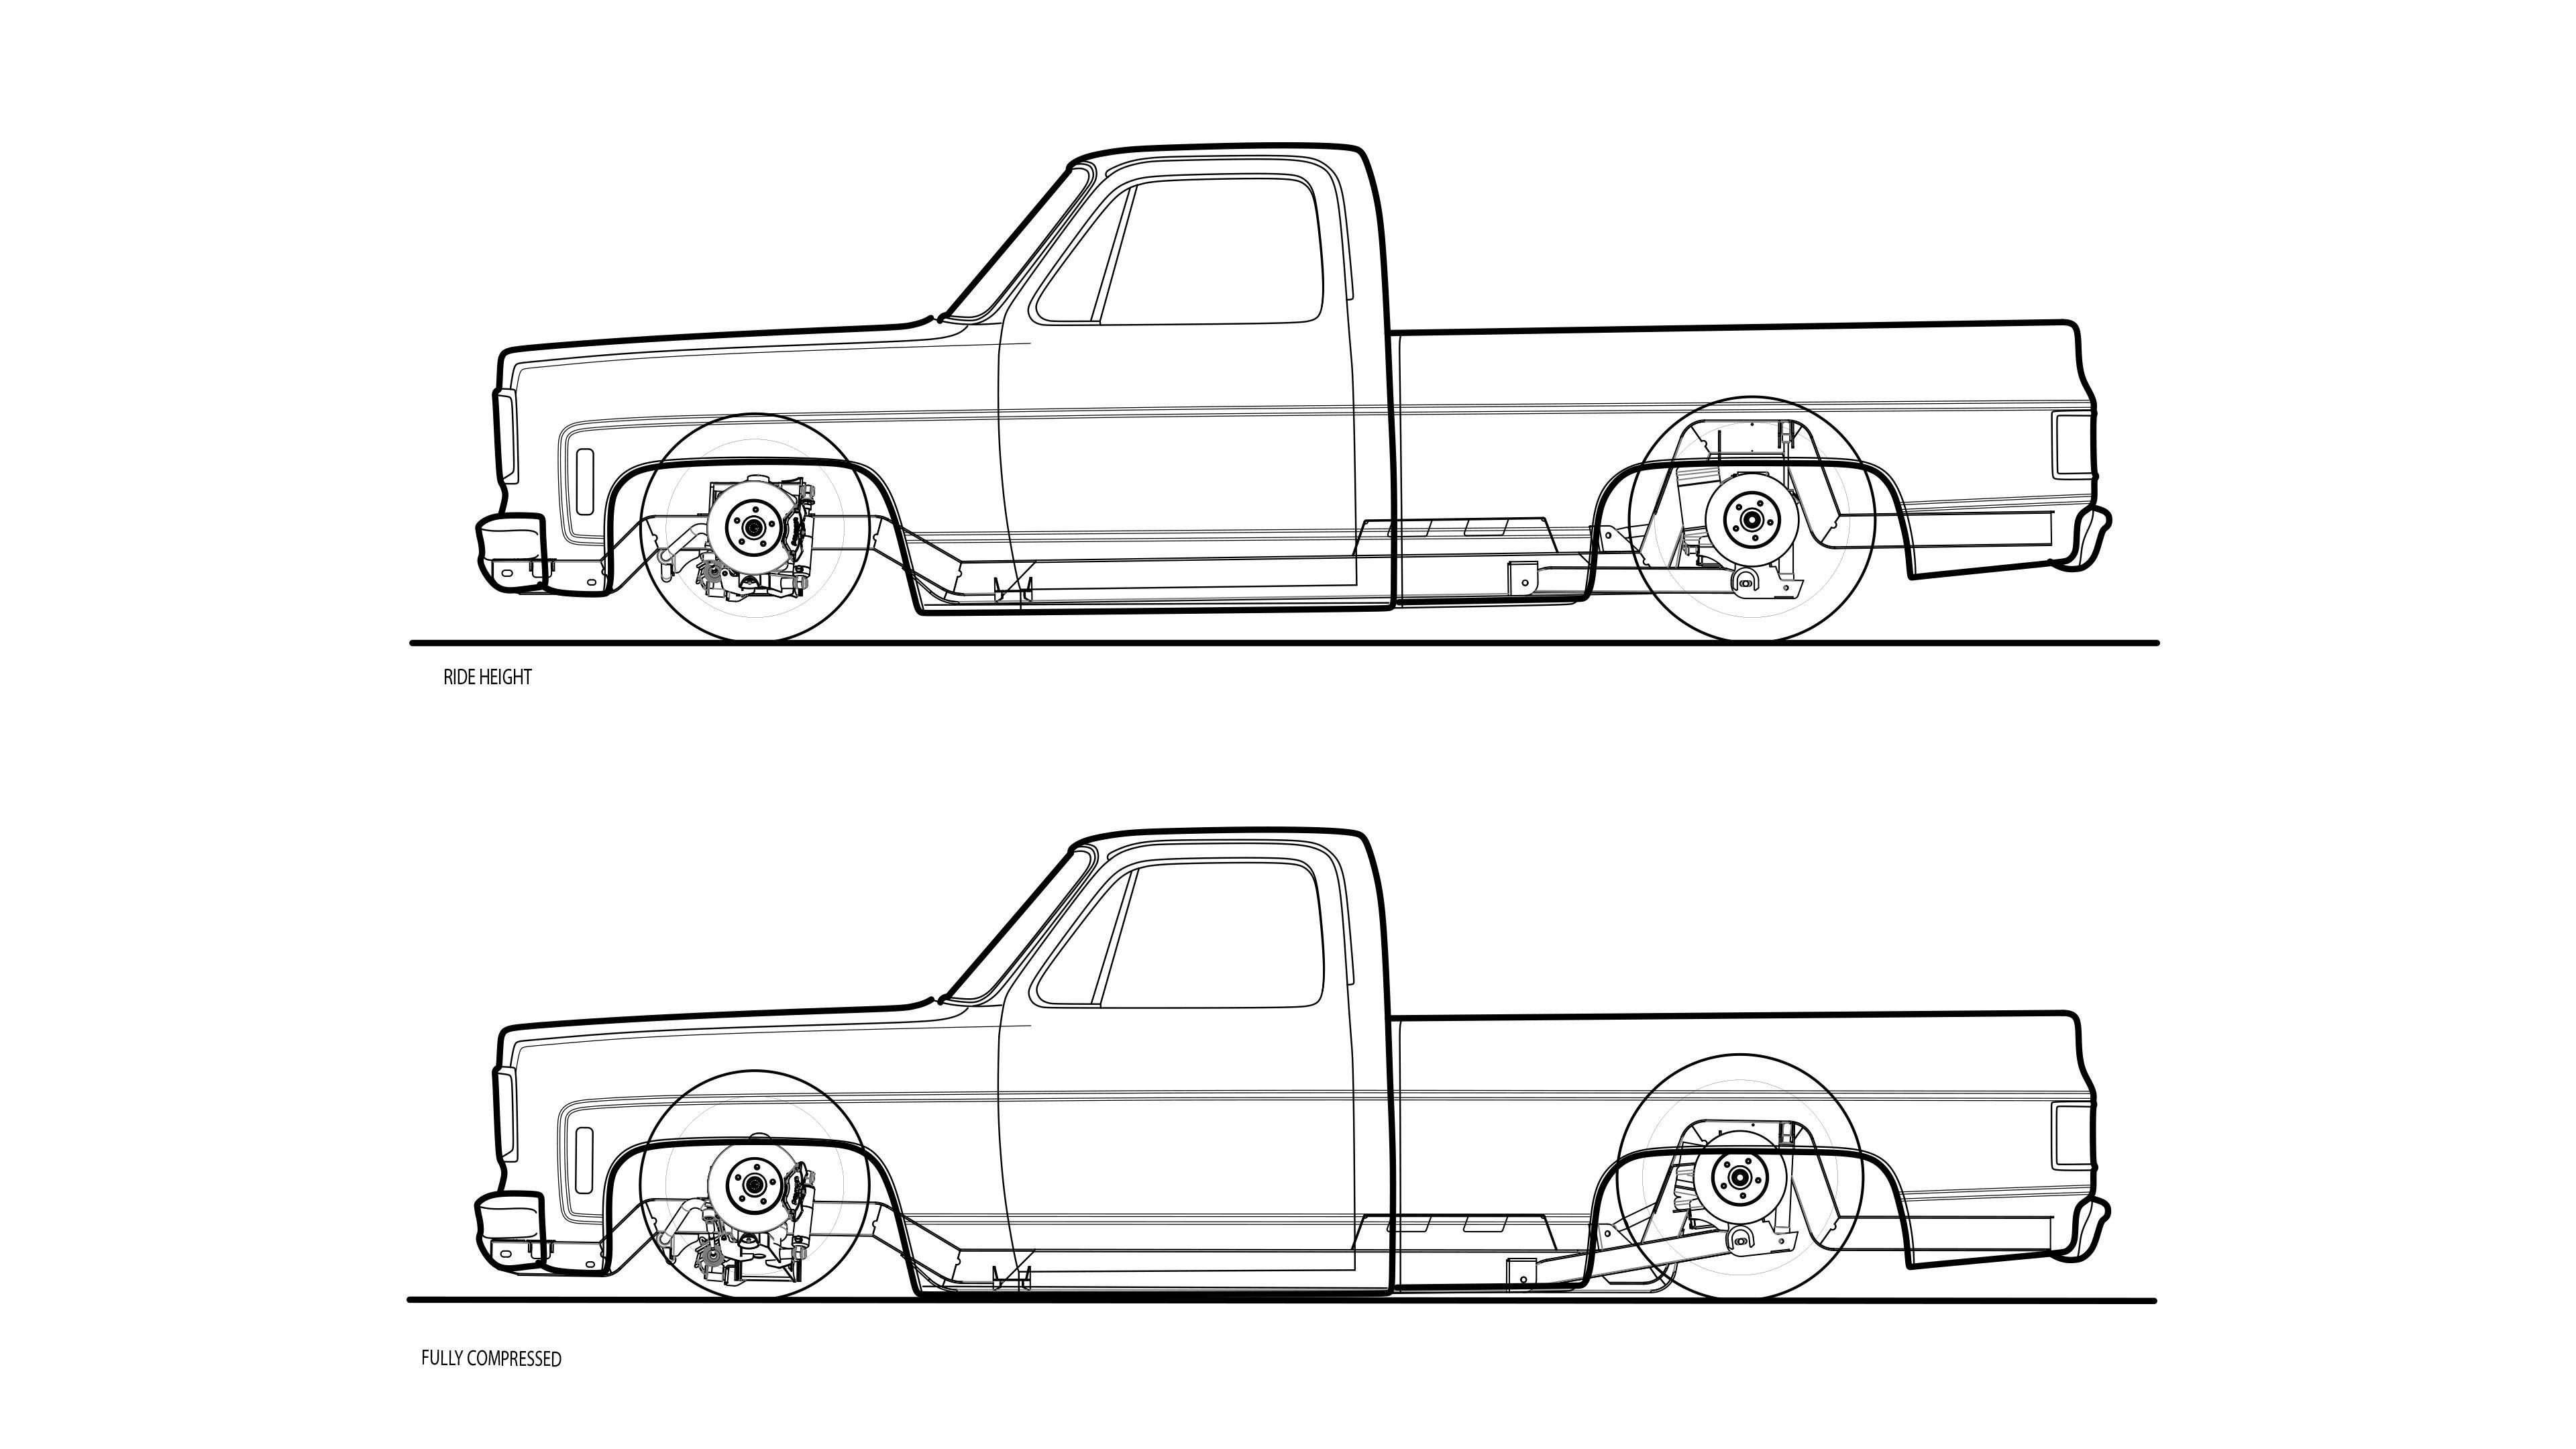 gmpartsbookdiagrams gm 85 rear end car